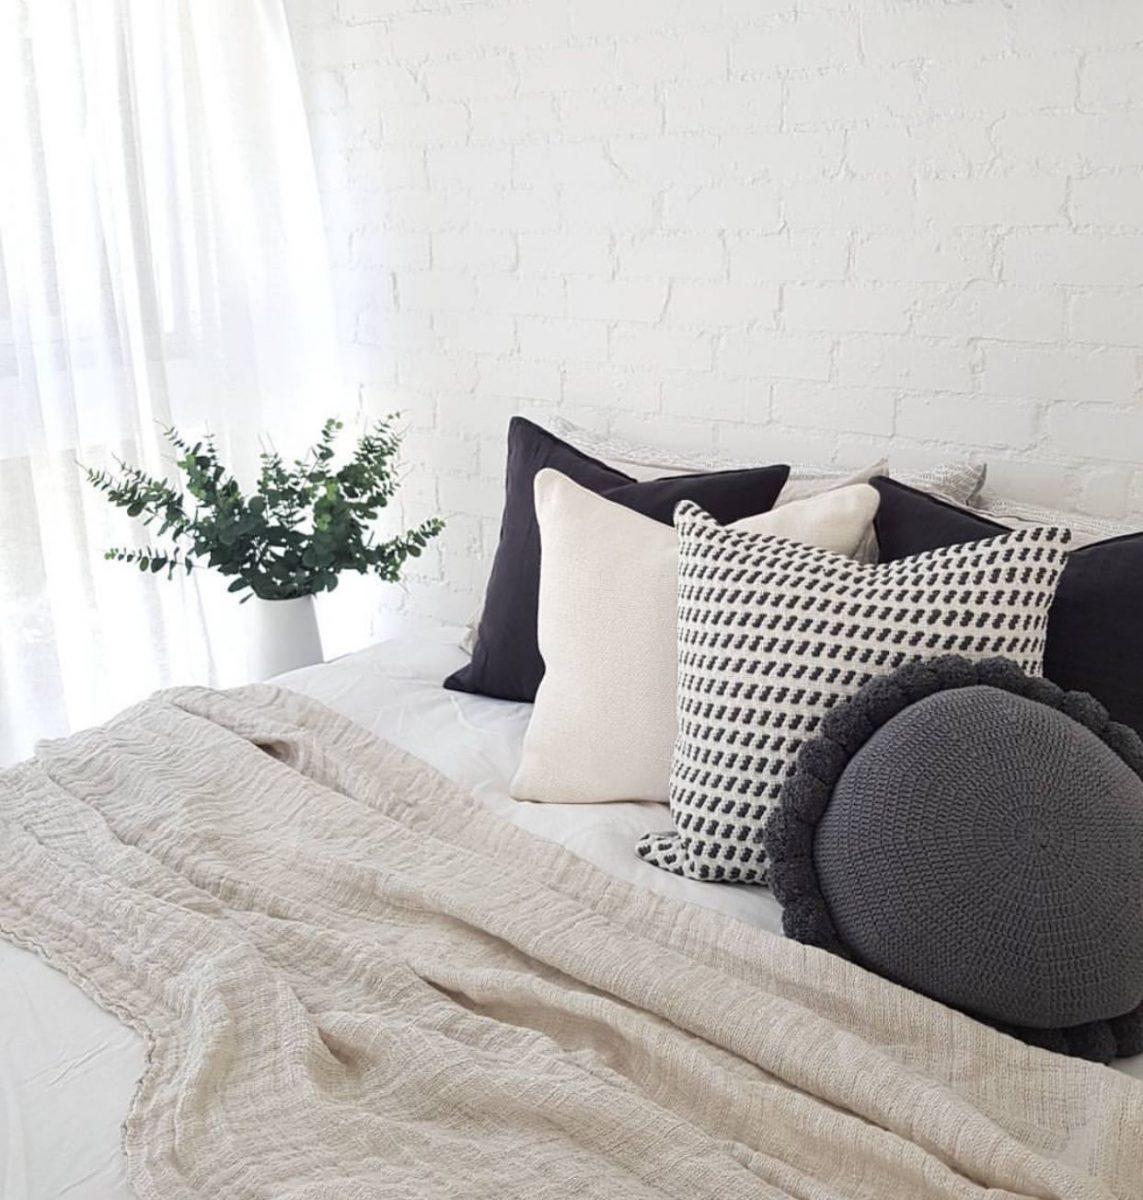 18norsu-interiorsclosely-knit-soleil-pom-pom-cushion-slate-grey-1200x1200.jpg